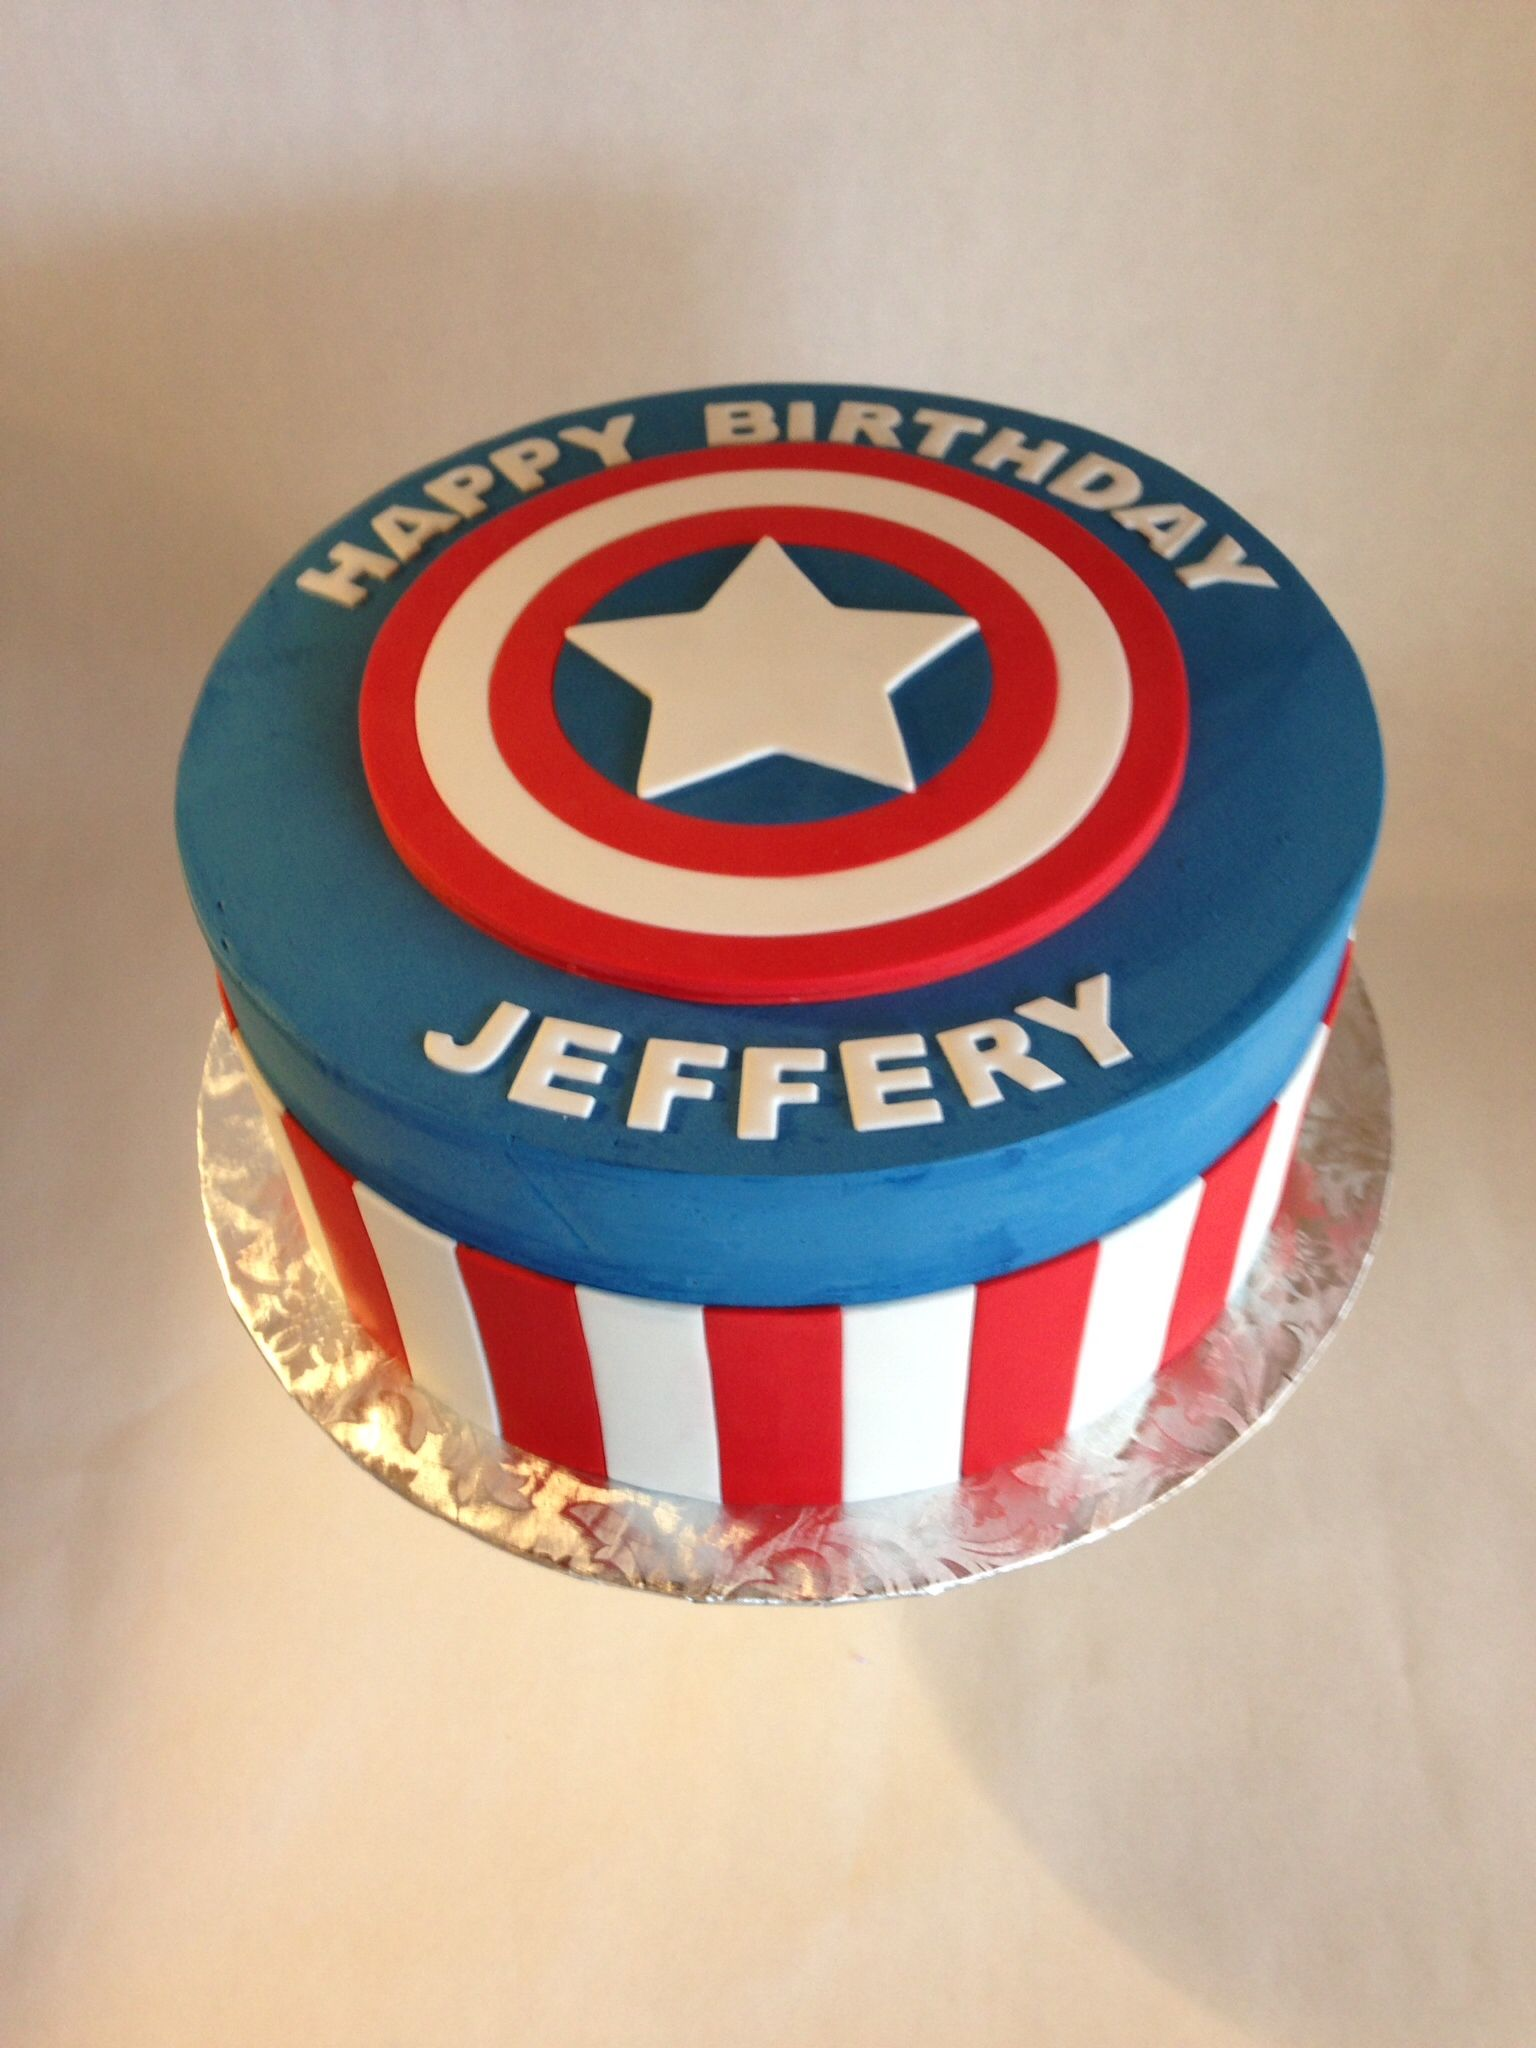 Wondrous Captain America Cake Birthday Cake Fondant Captain America Funny Birthday Cards Online Alyptdamsfinfo